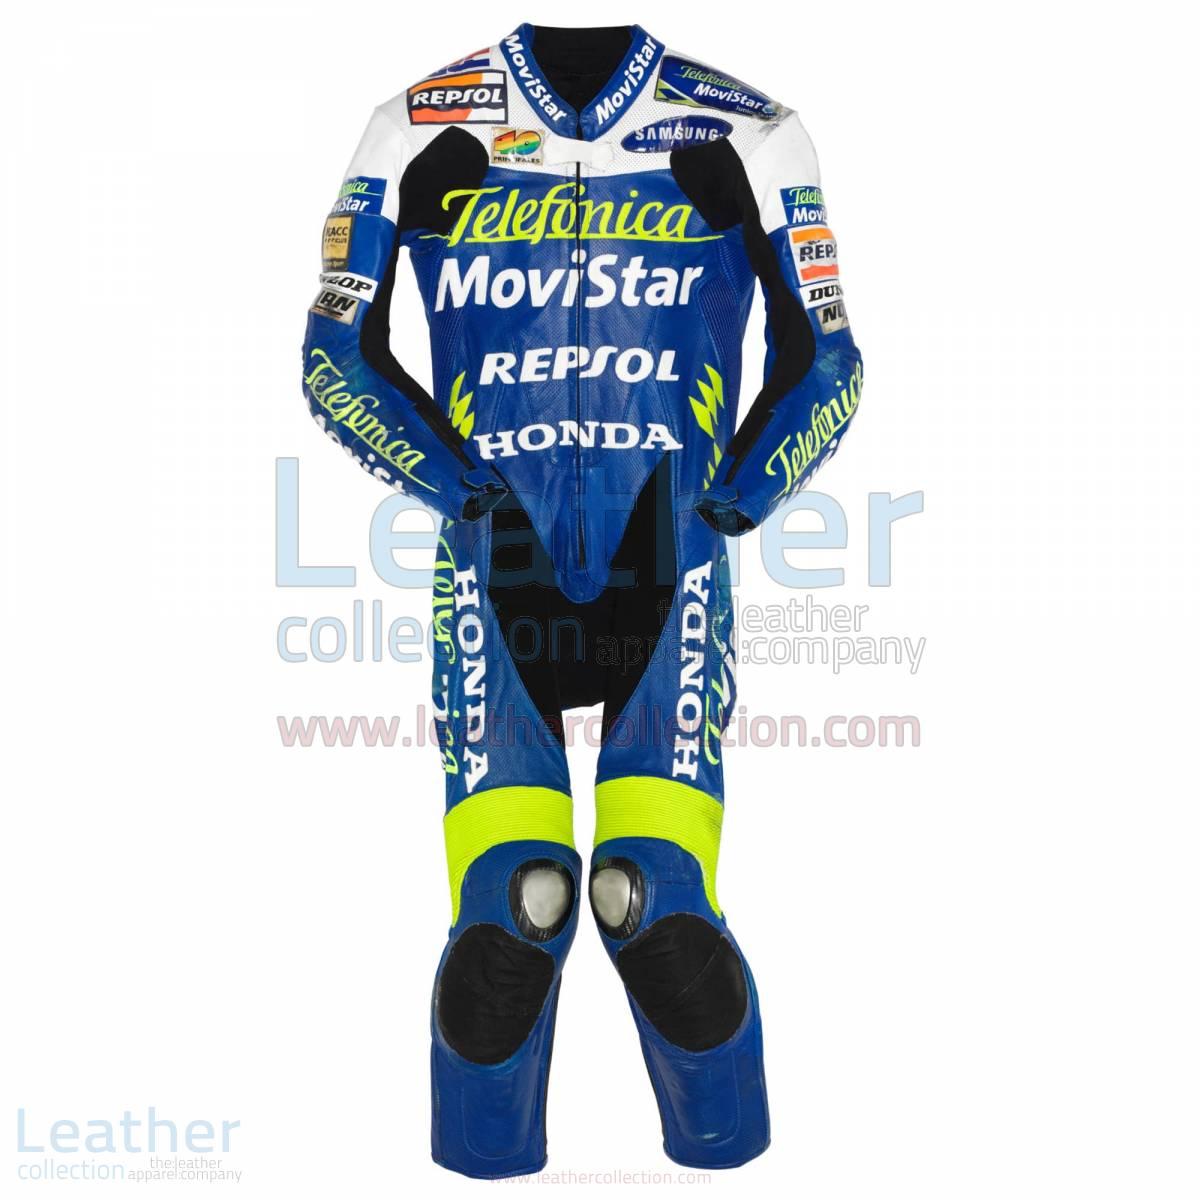 Dani Pedrosa Repsol Honda GP 2003 Leathers